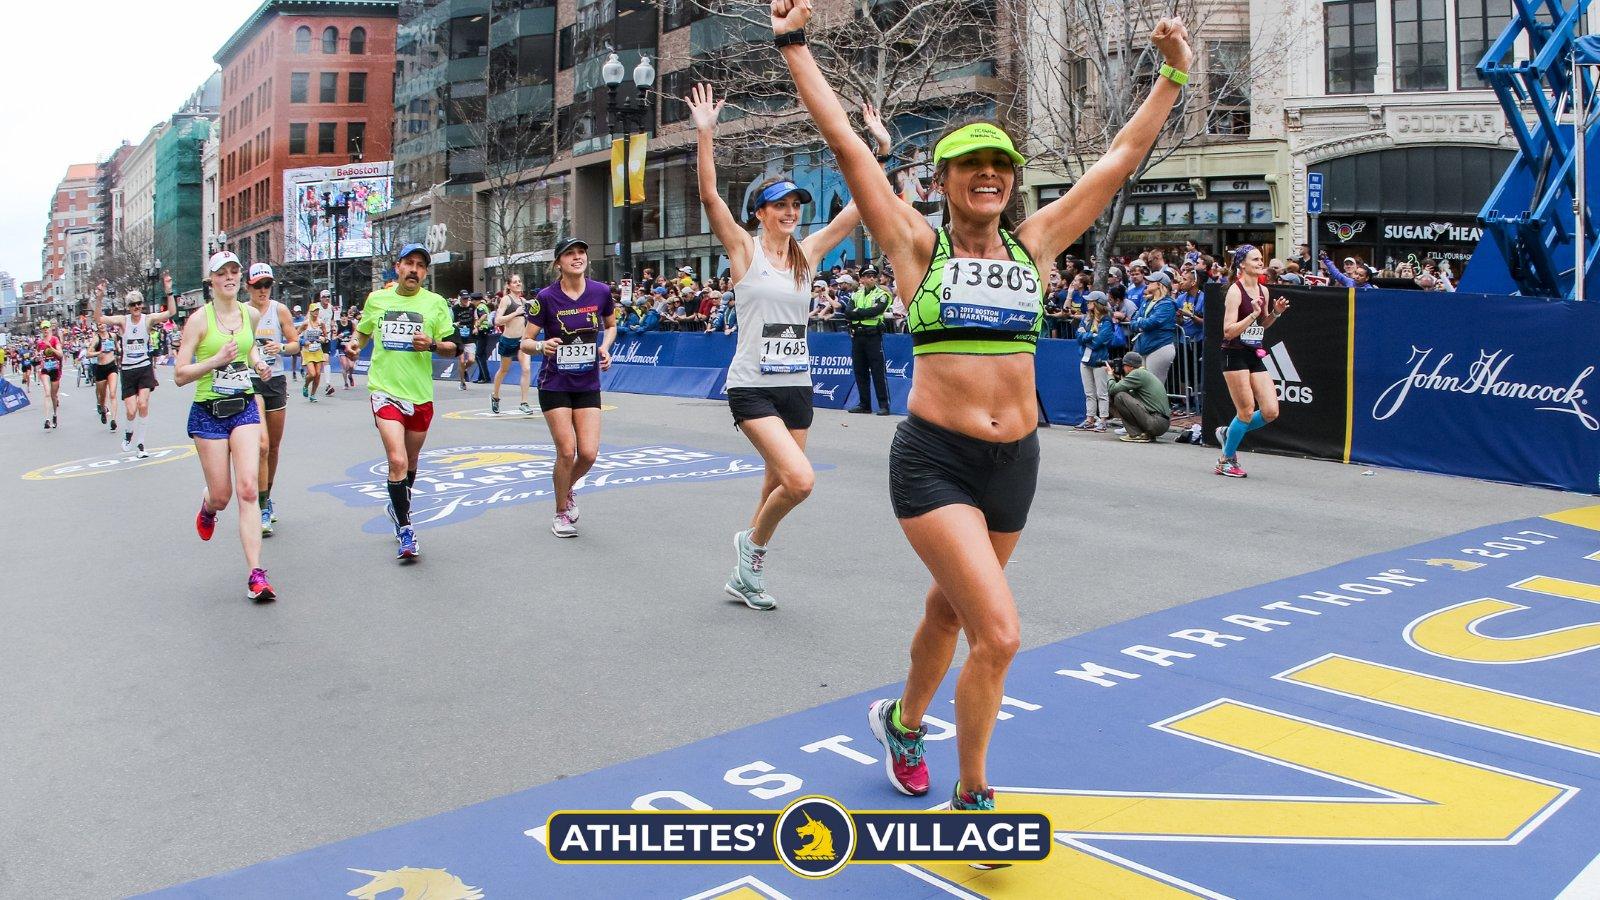 2021 adalah tahun pertama Boston Marathon membuka lari virtual untuk pelari di seluruh dunia tanpa mengurangi atlet berdasarkan standar BQ.  Foto: Marathon Boston